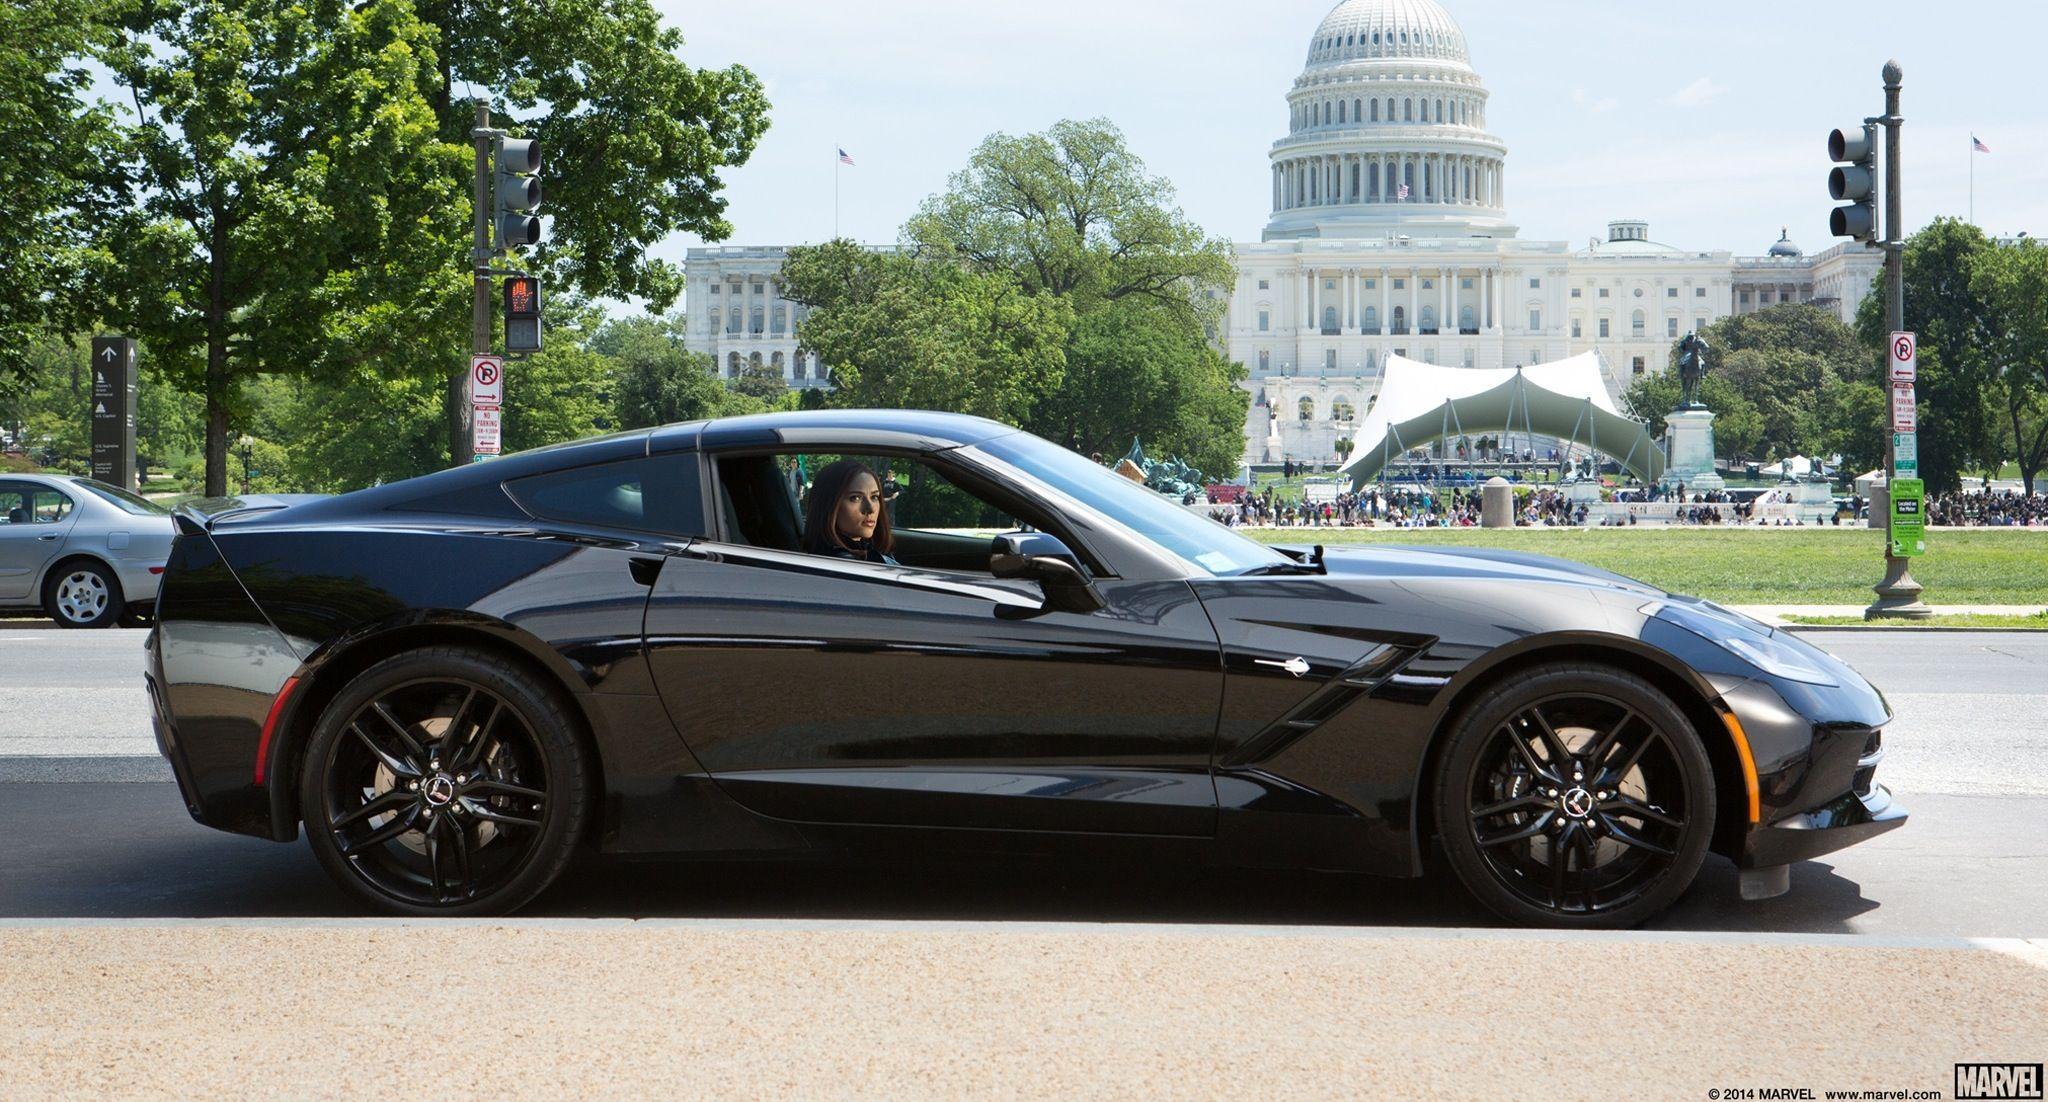 Chevrolet corvette stingray c7 2014 driven by scarlett johansson in captain america the